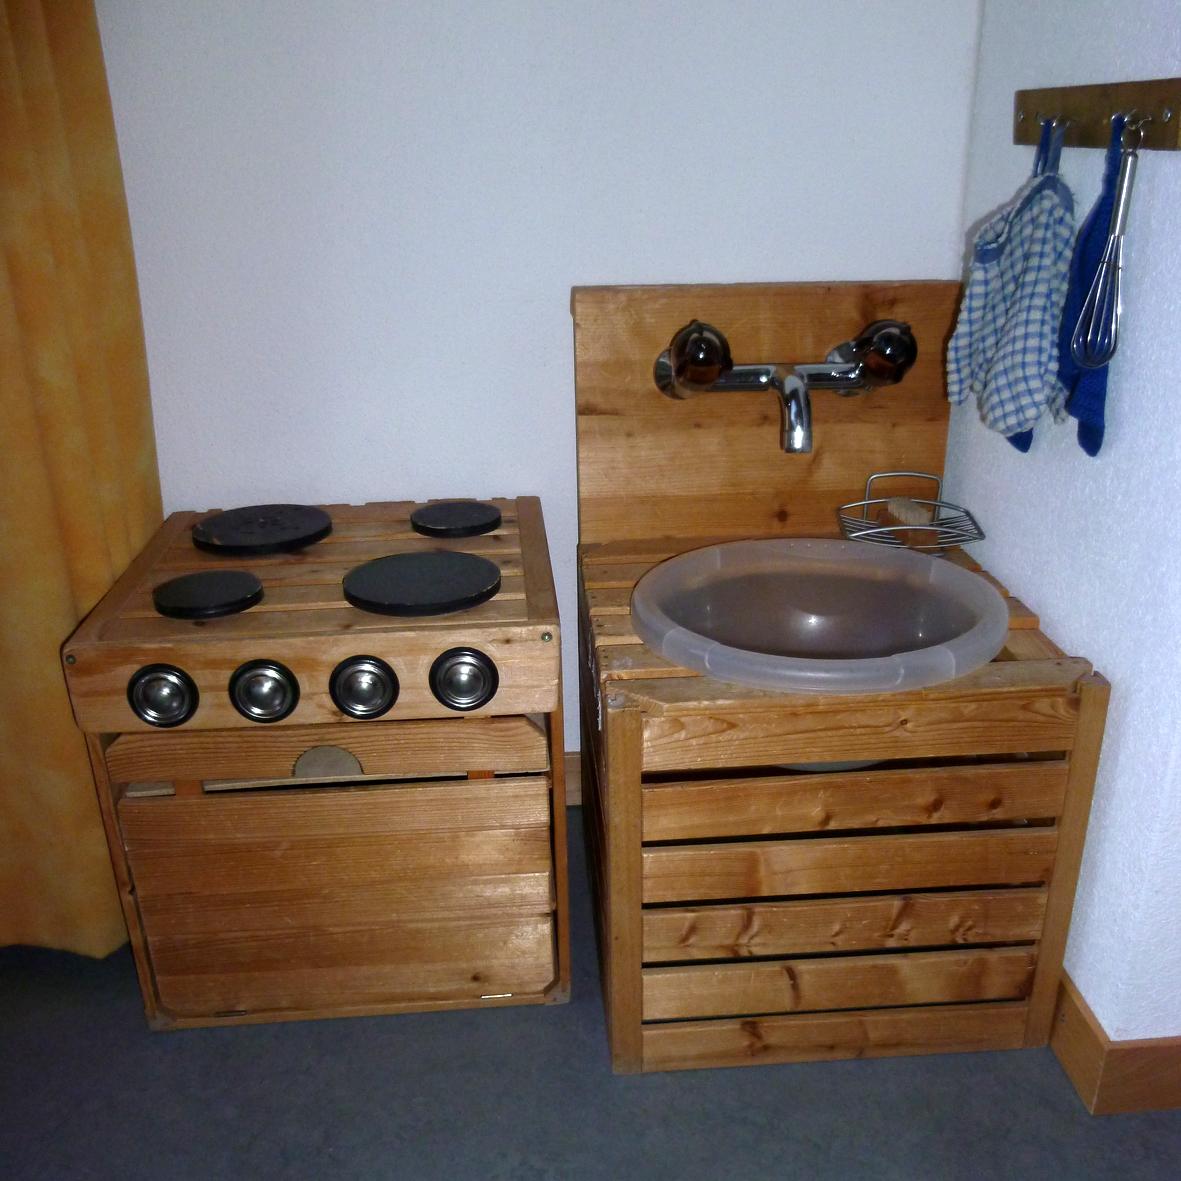 ikea duktig küche angebot